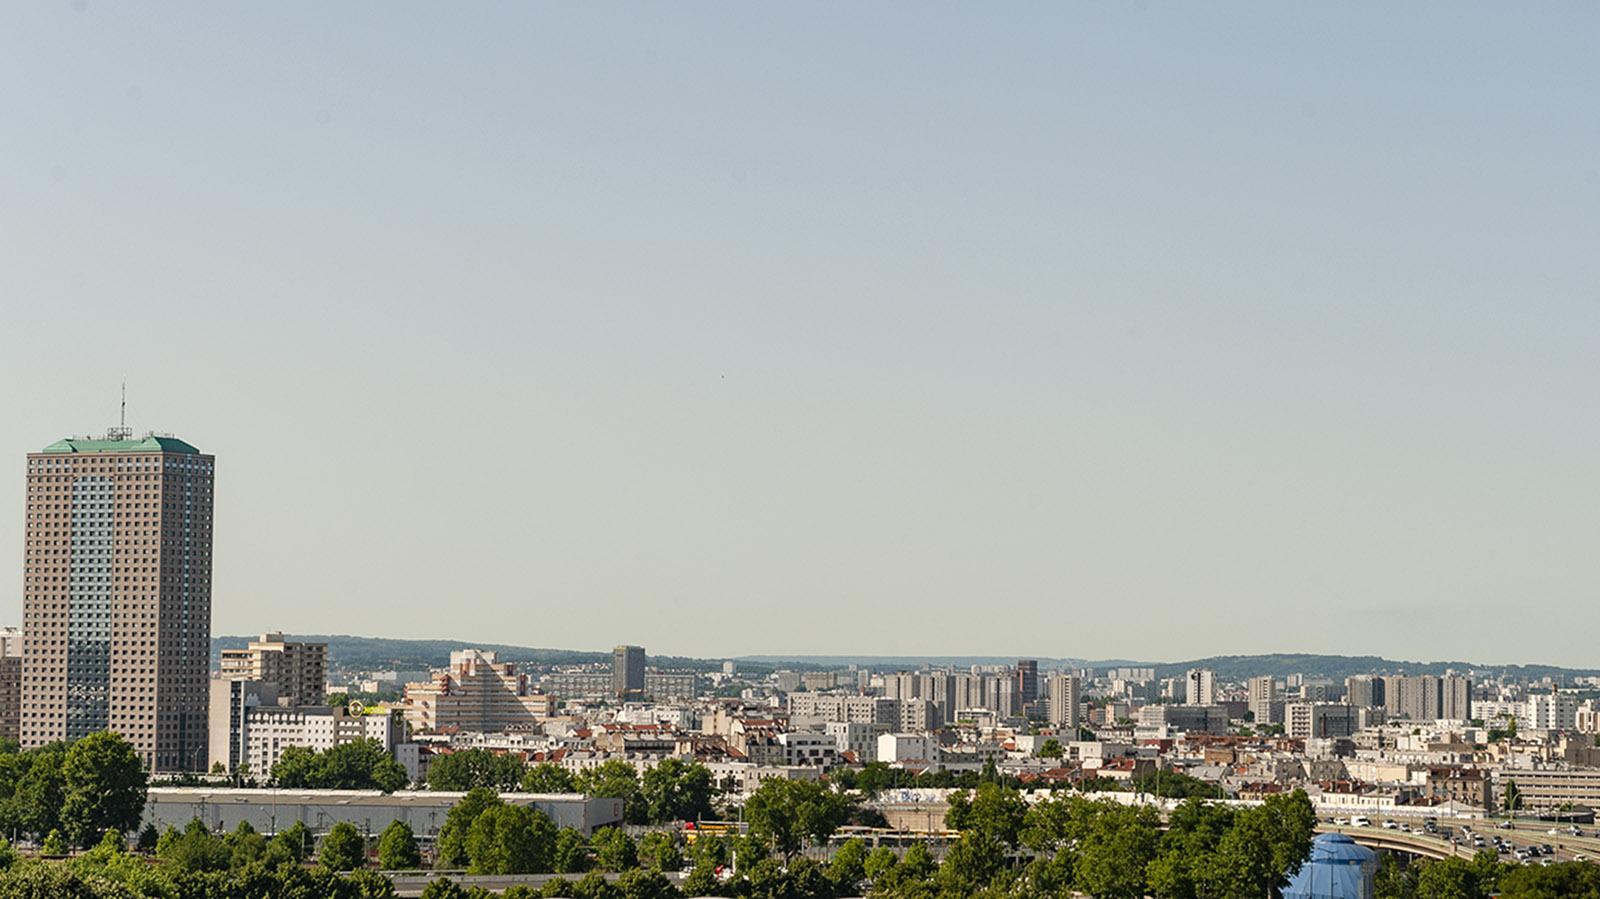 Banlieue de Paris. Blick von der Pariser Philharmonie auf Aubervilliers. Foto: Hilke Maunder